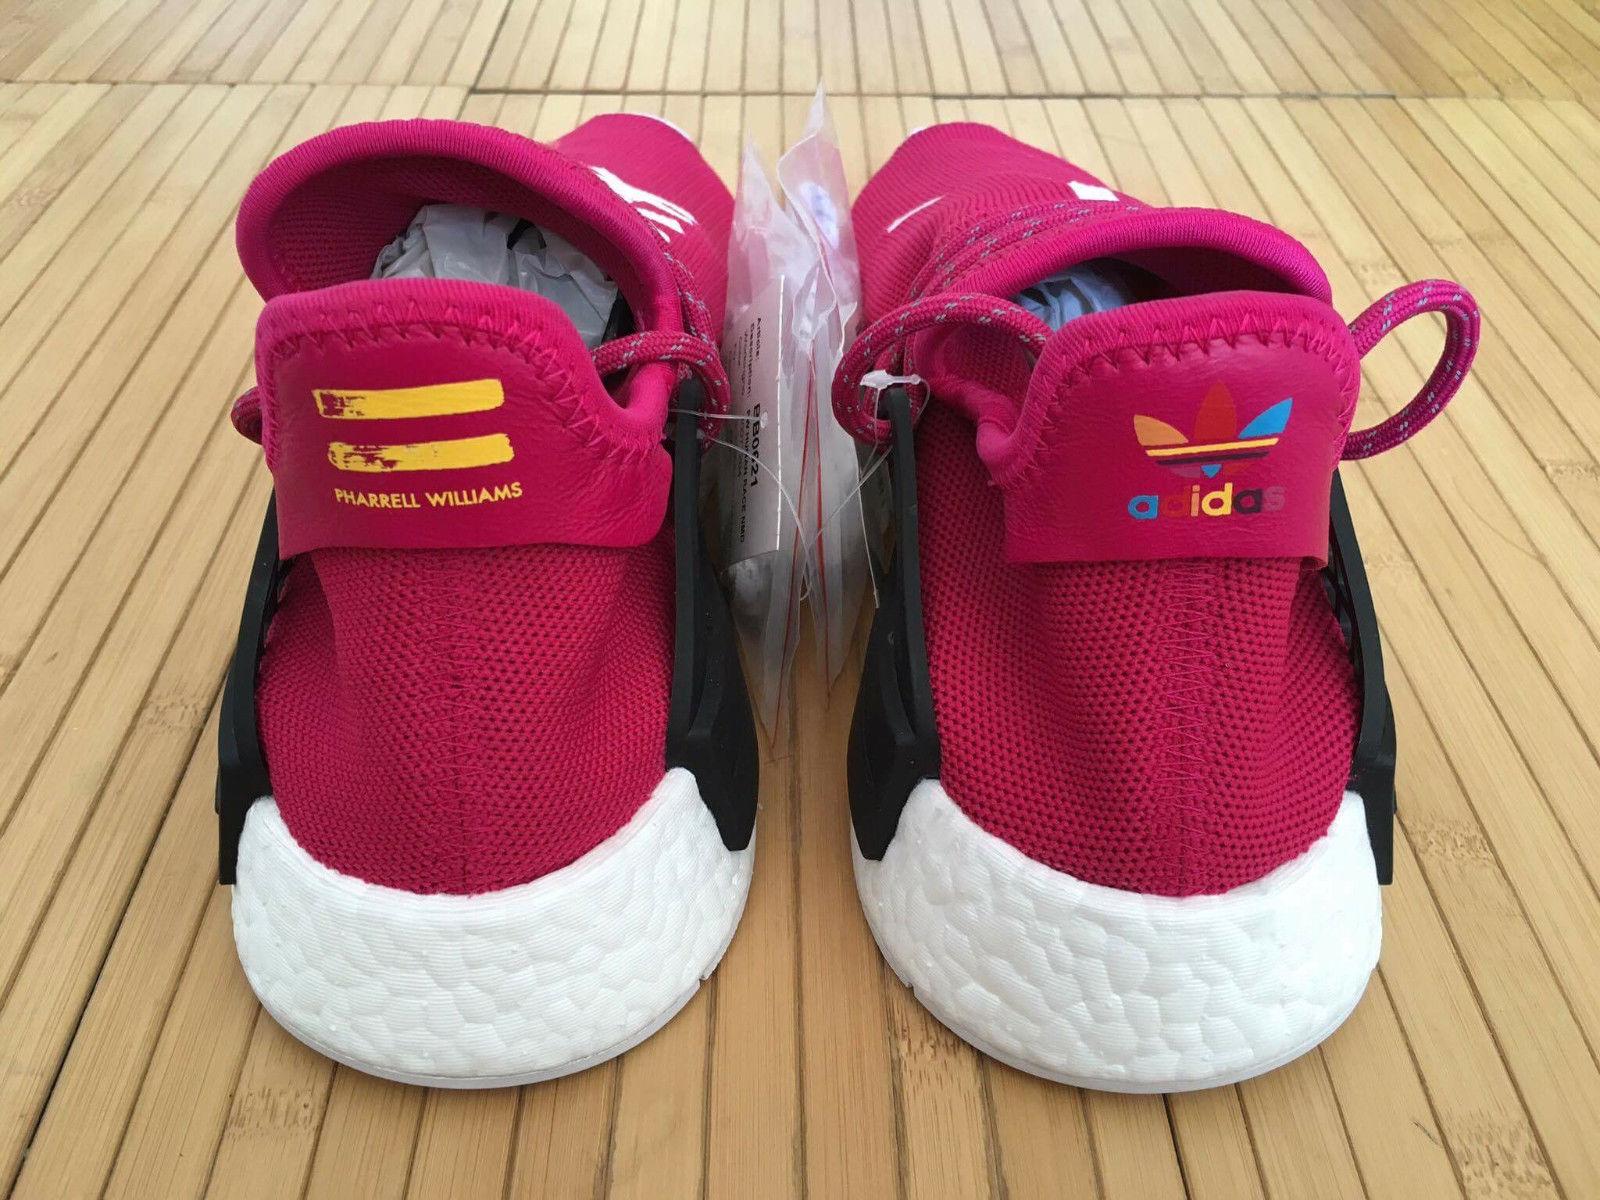 UnReleased Sample Adidas NMD Human Race 2